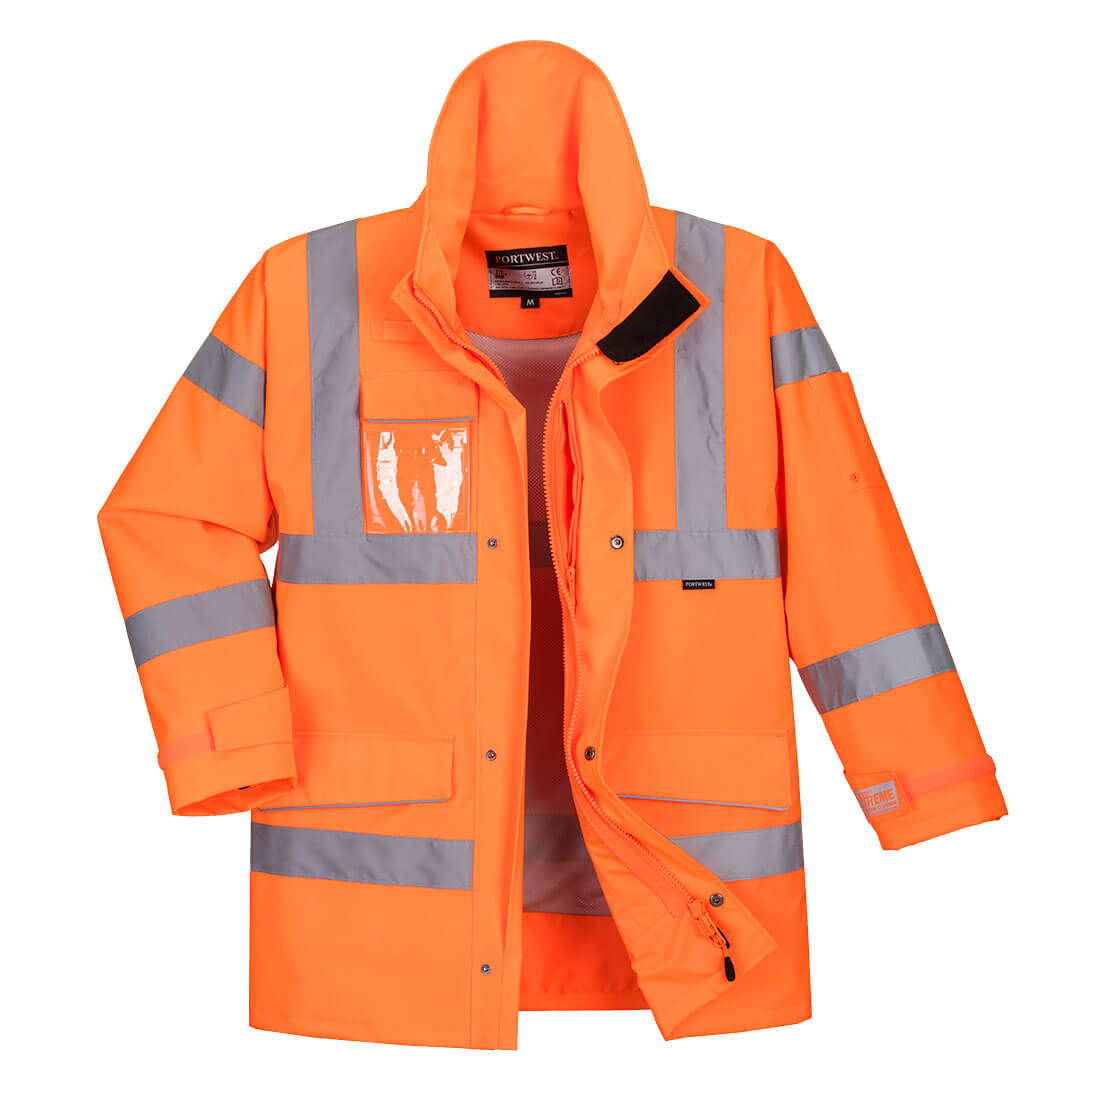 Portwest Extreme Parka Jacket